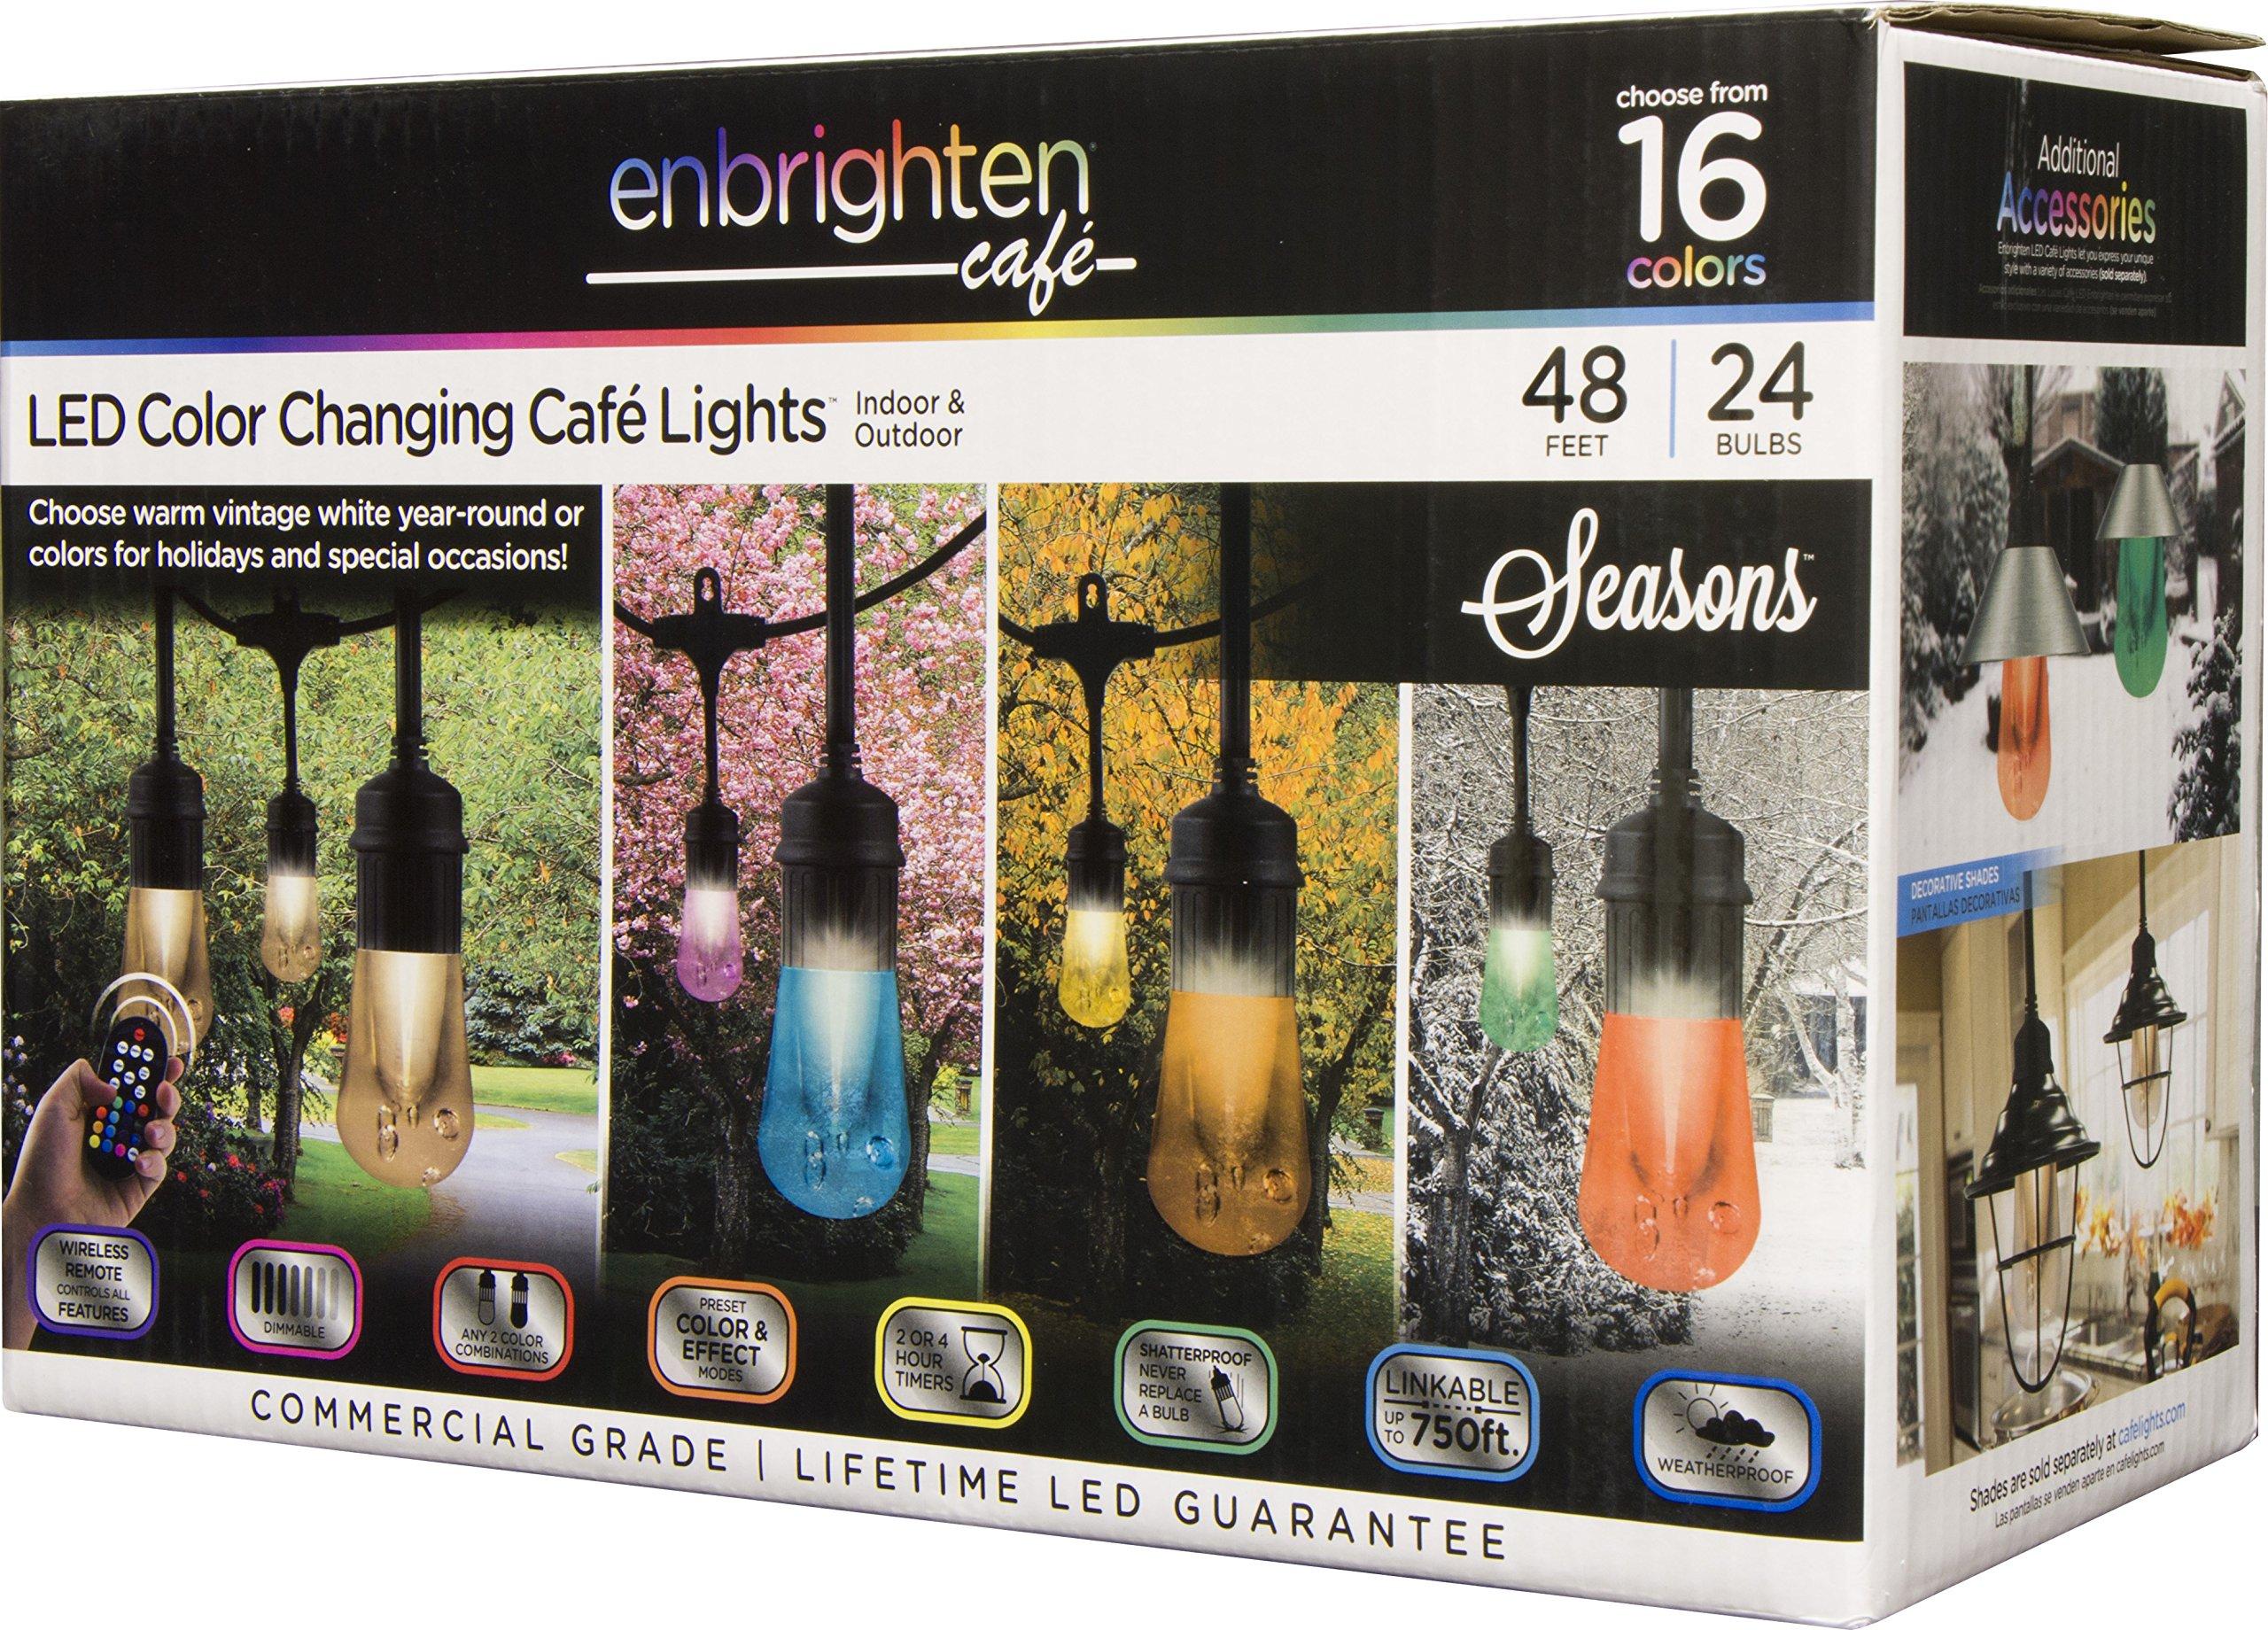 Enbrighten 37790 Vintage Seasons LED Warm White & Color Changing Café String Lights, Black, 48ft, 24 Premium Impact Resistant Lifetime Bulbs, Wireless, Weatherproof, Indoor/Outdoor, 48 ft, by Enbrighten (Image #12)